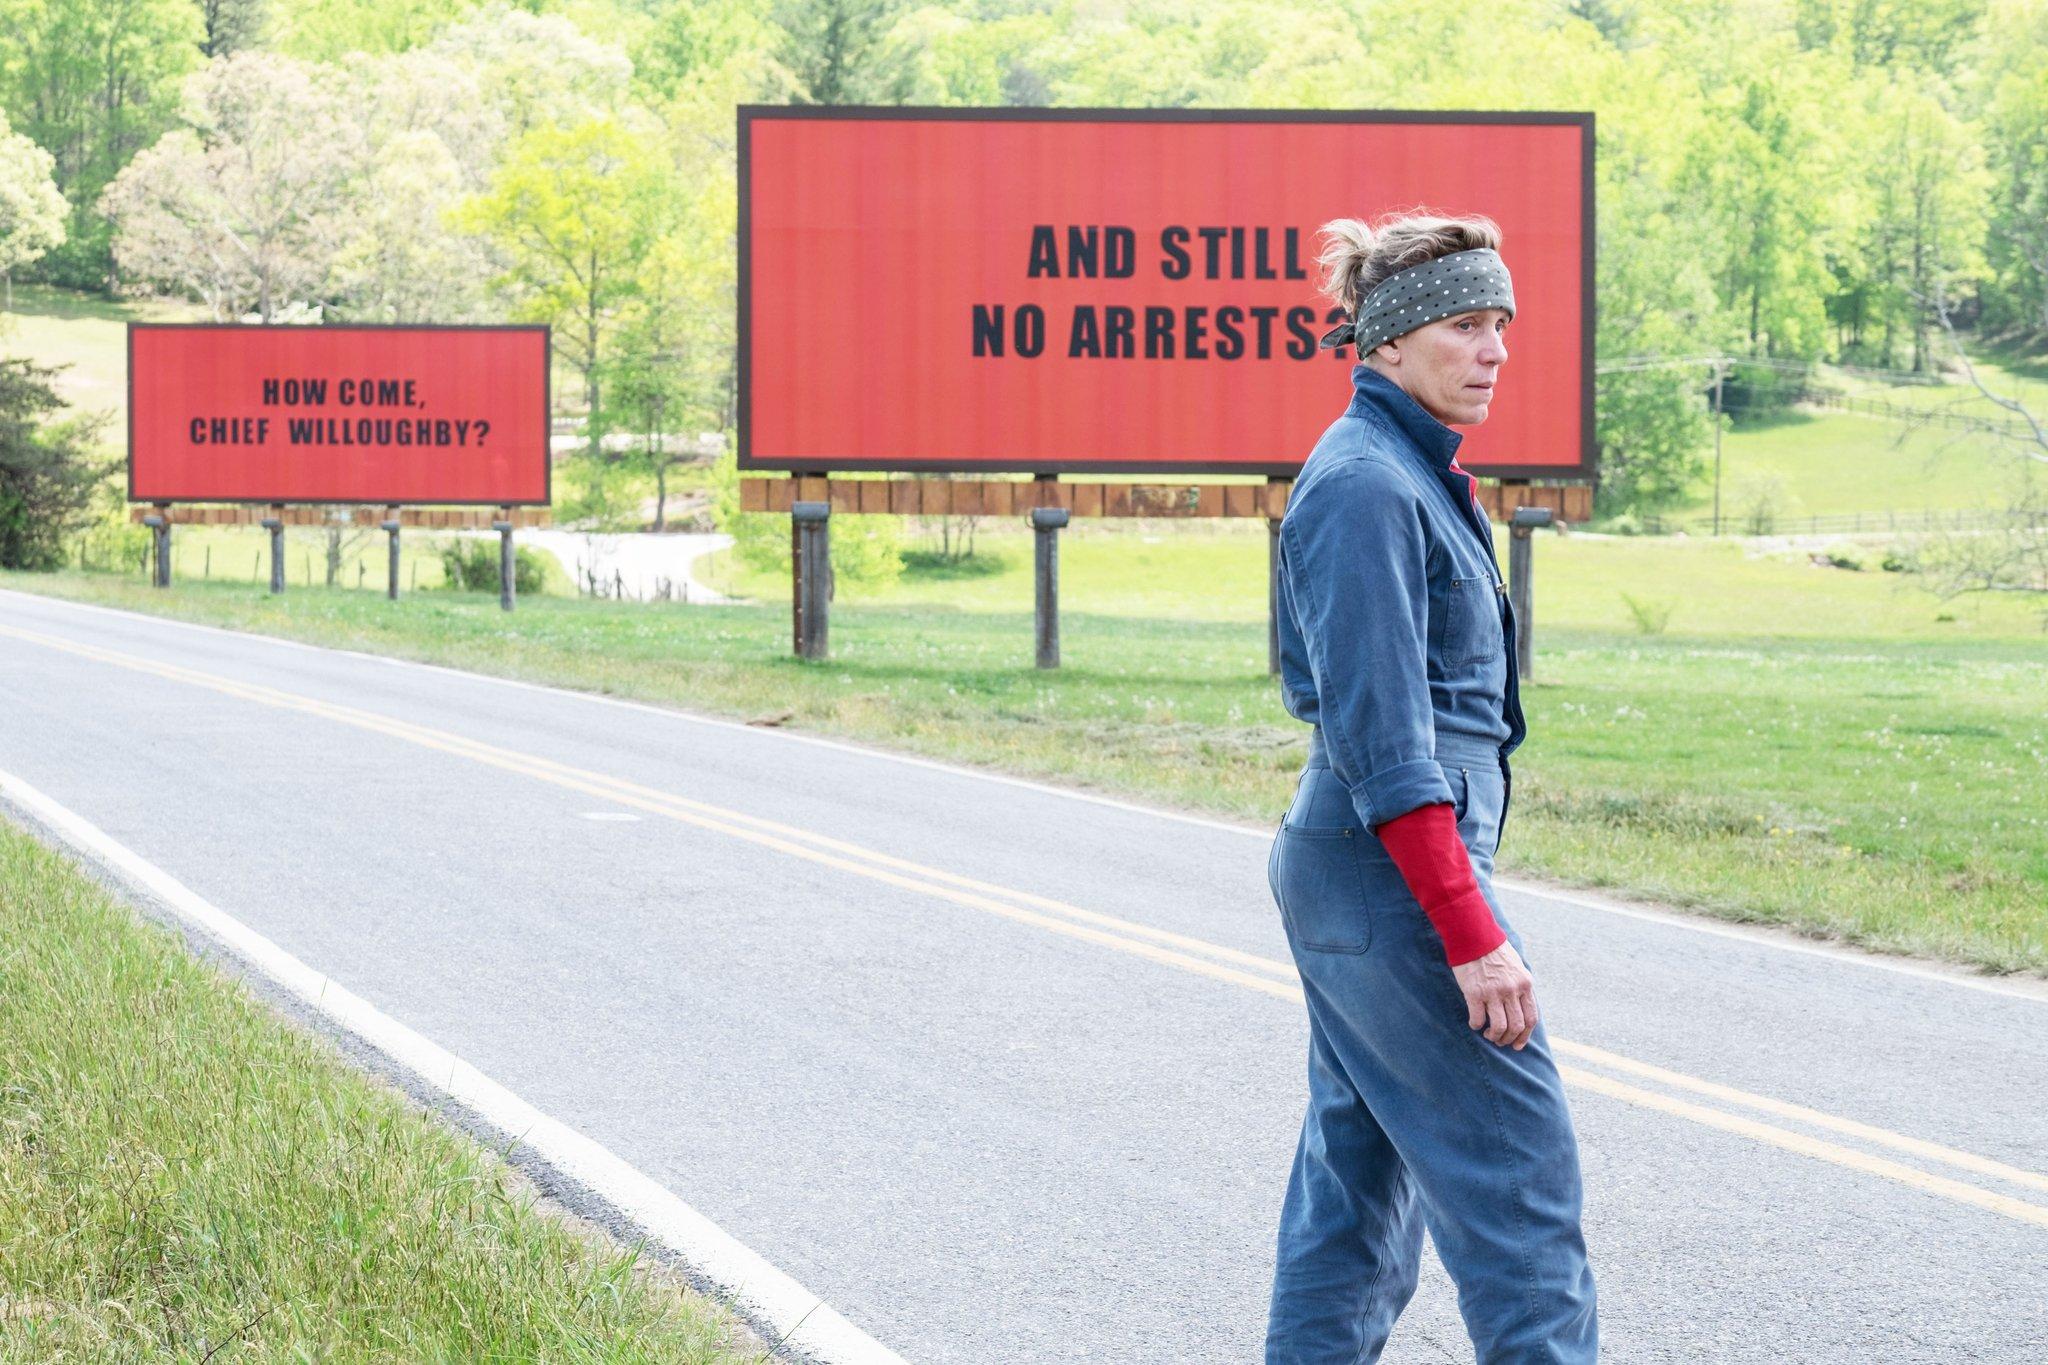 Frances McDormand in Three Billboards Outside Ebbing Missouri